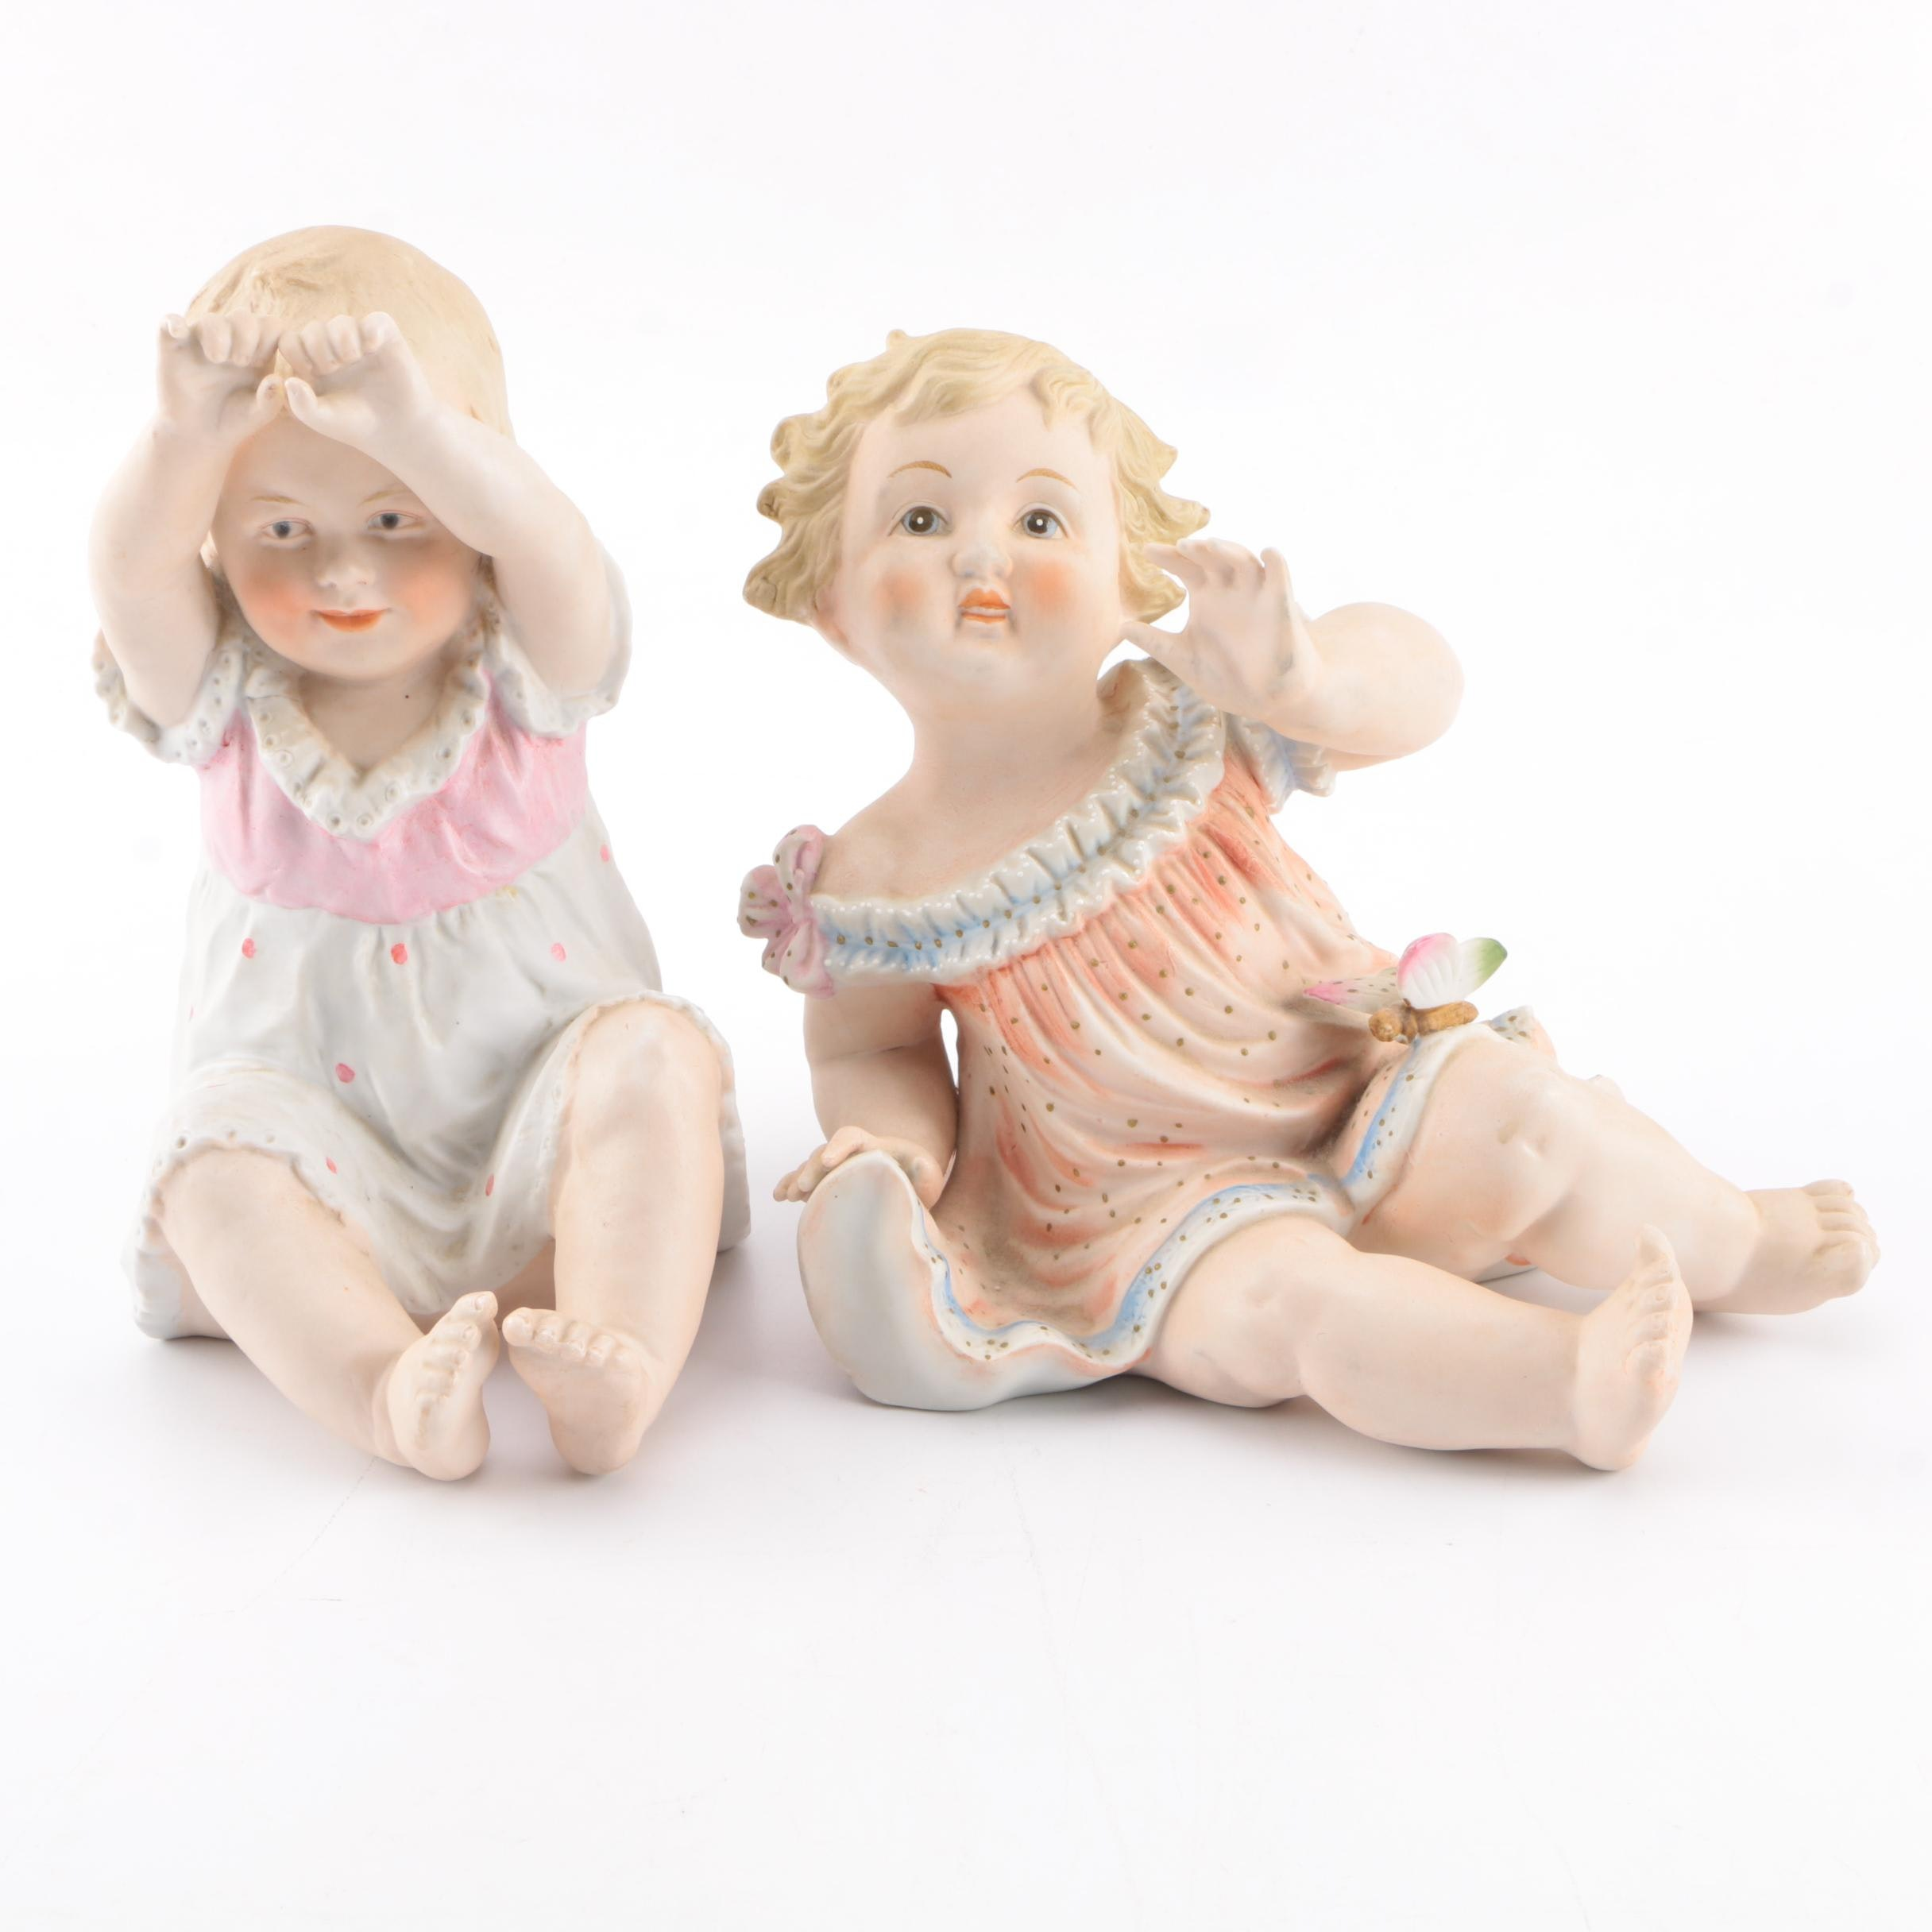 Pair of Porcelain Infant Figurines